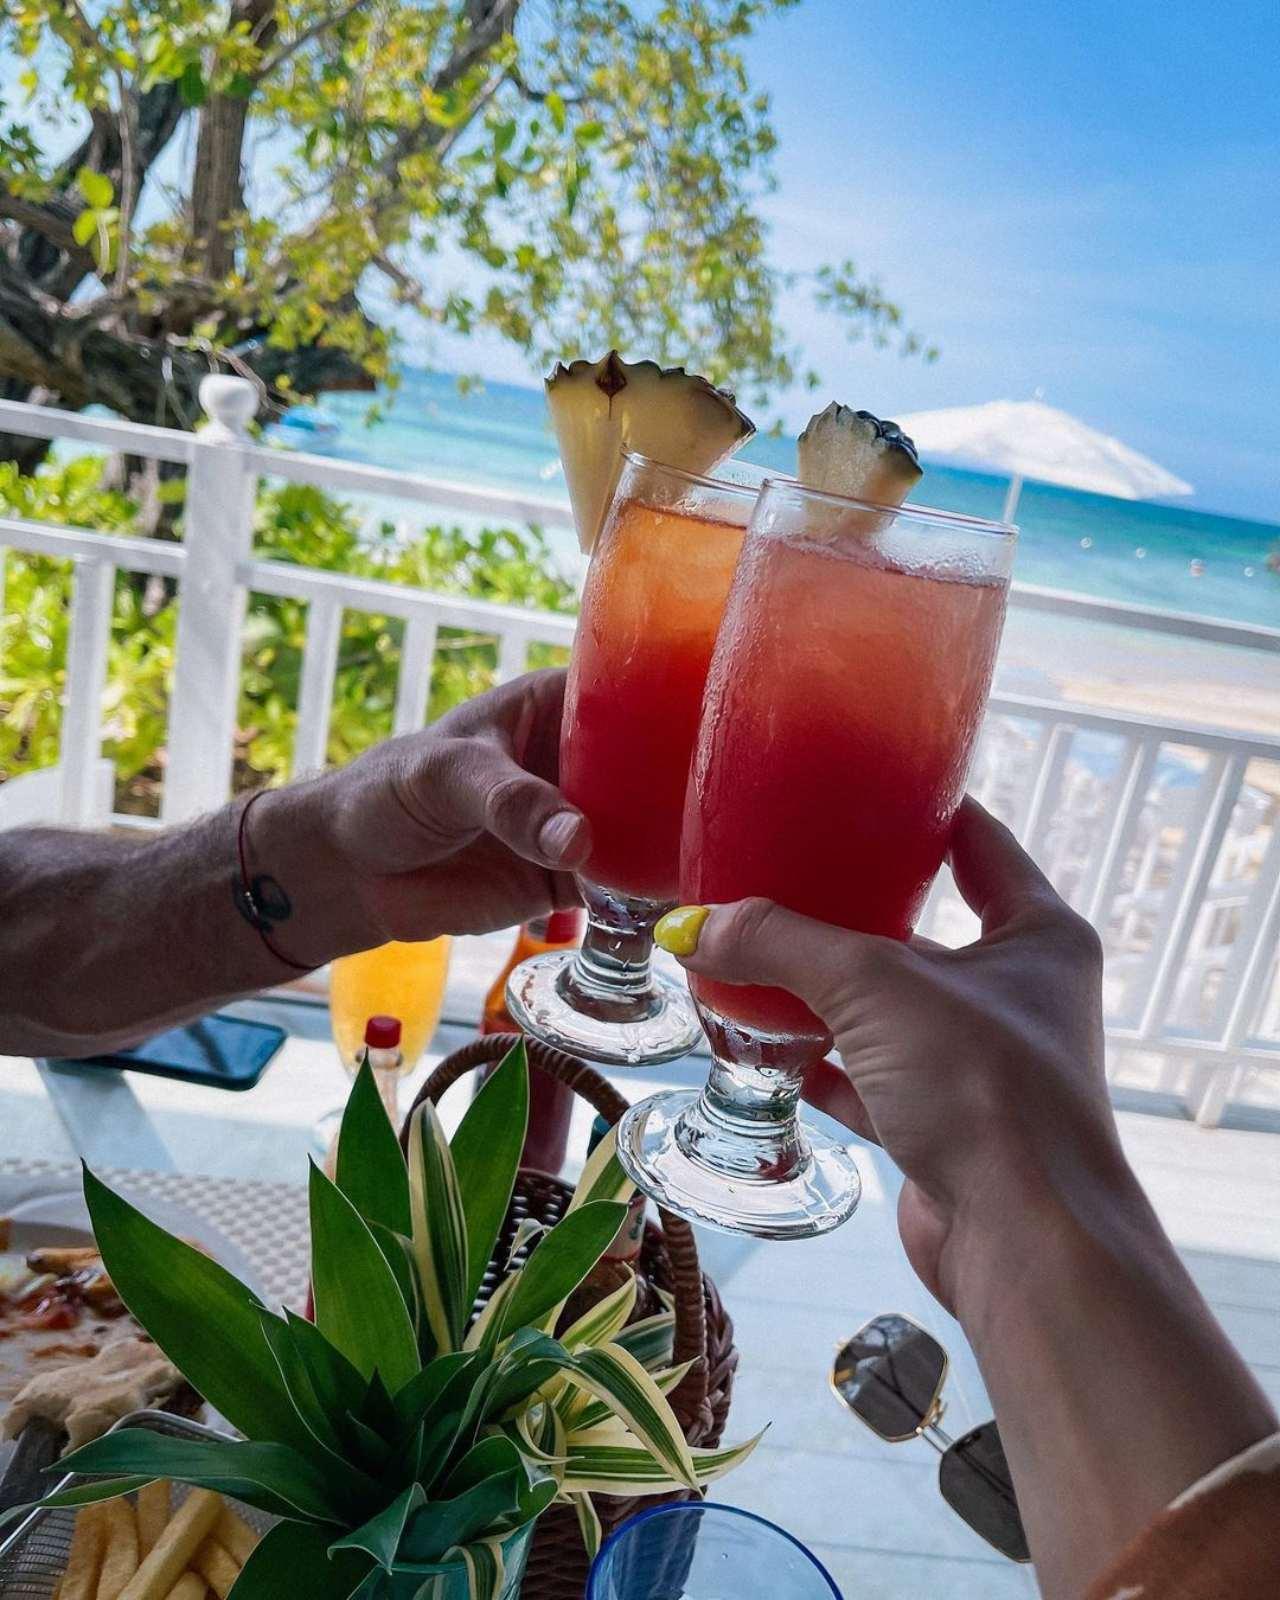 Gabriel Soto Irina baeva bebidas Jamaica